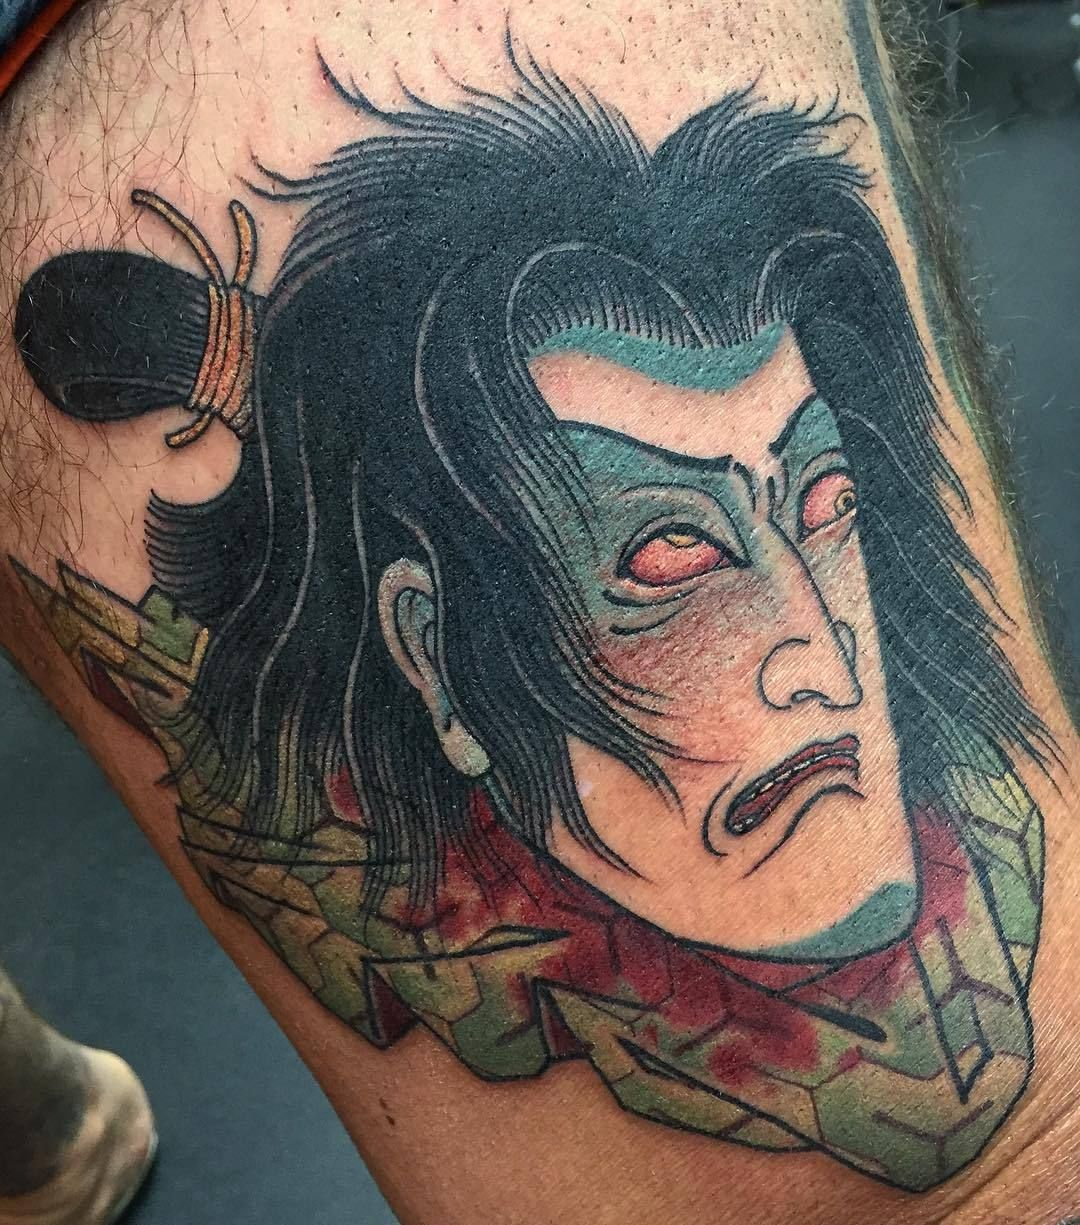 Artist ryan usher portrait tattoo tattoos polynesian